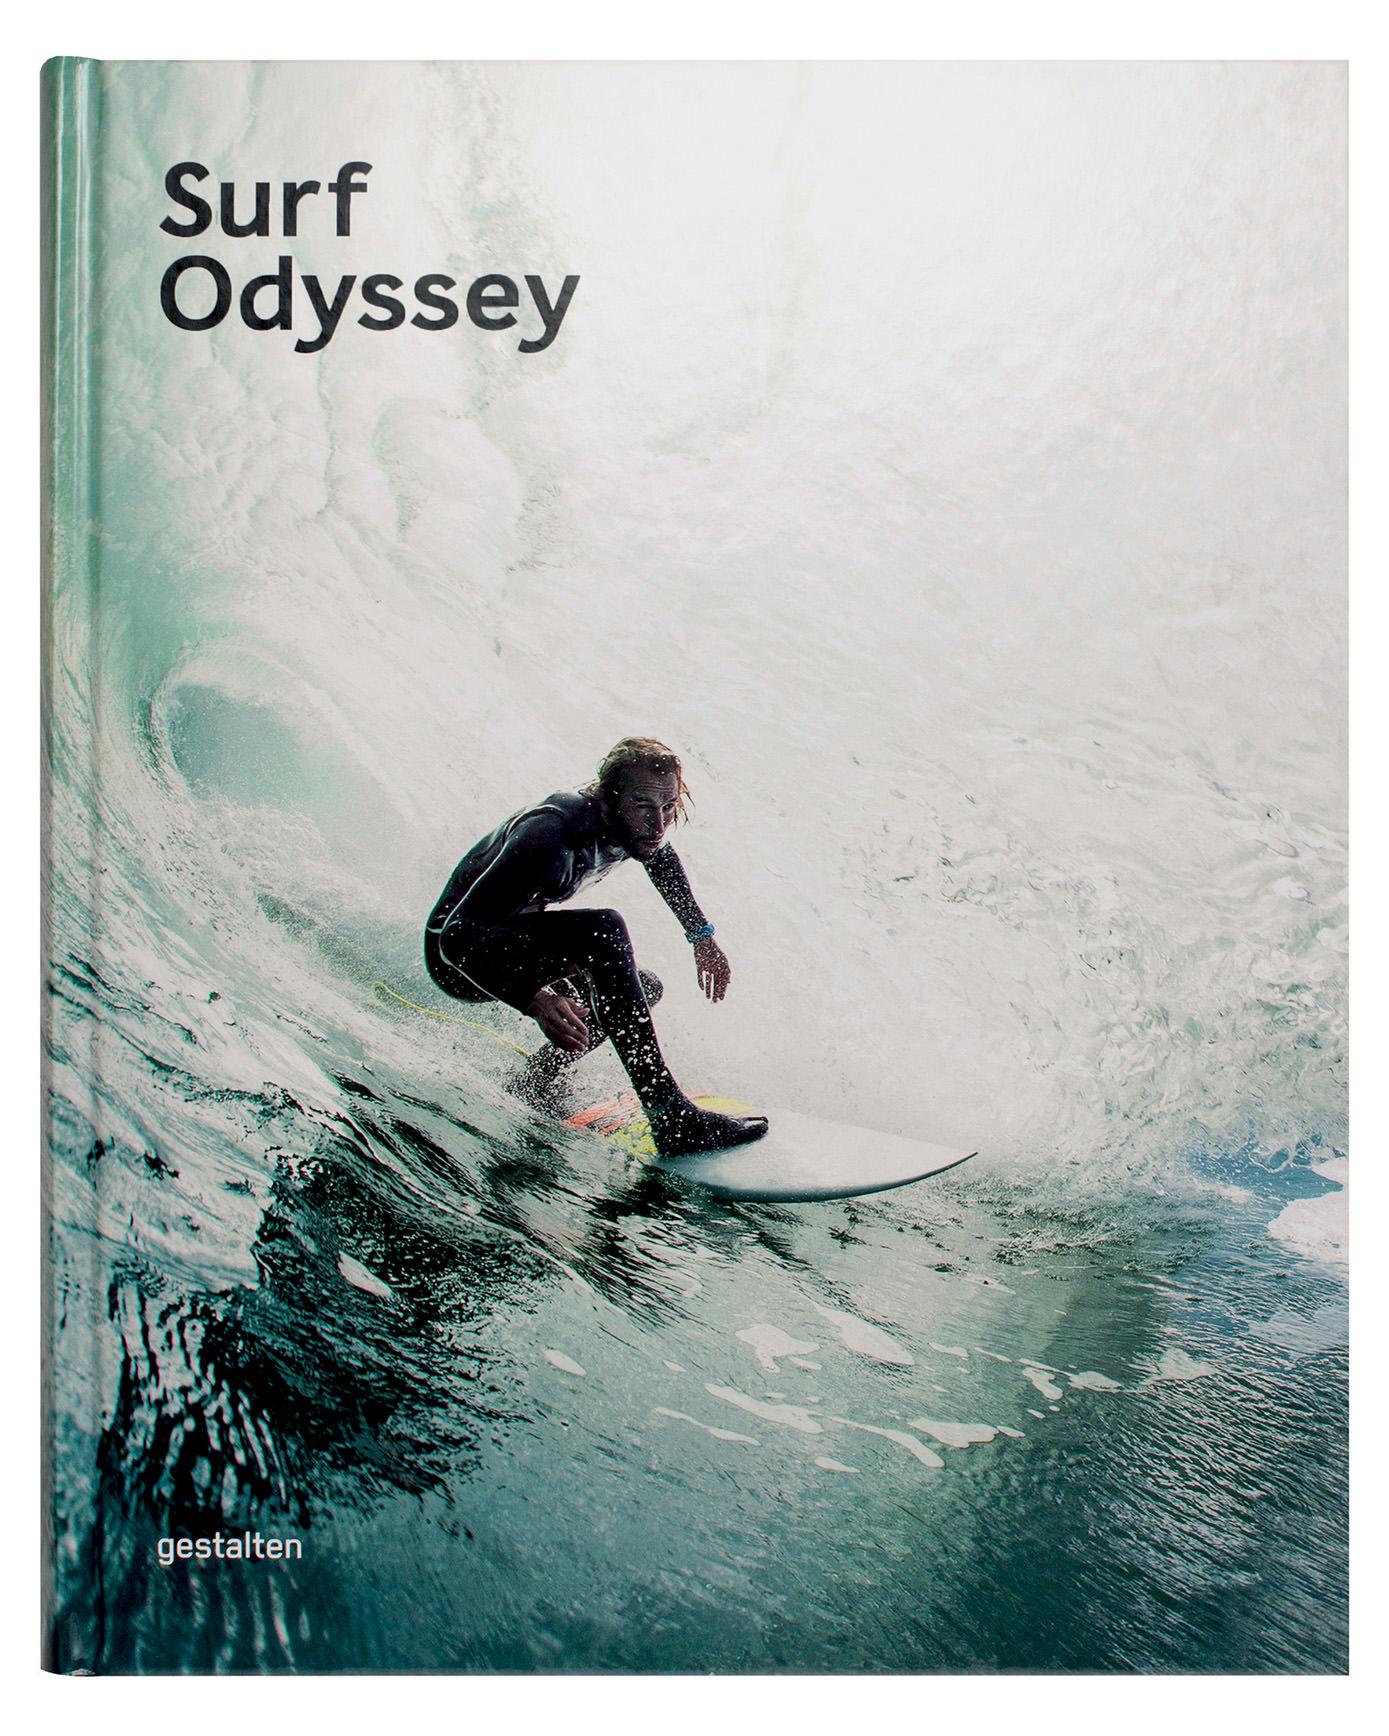 surfodyssey-1.jpg